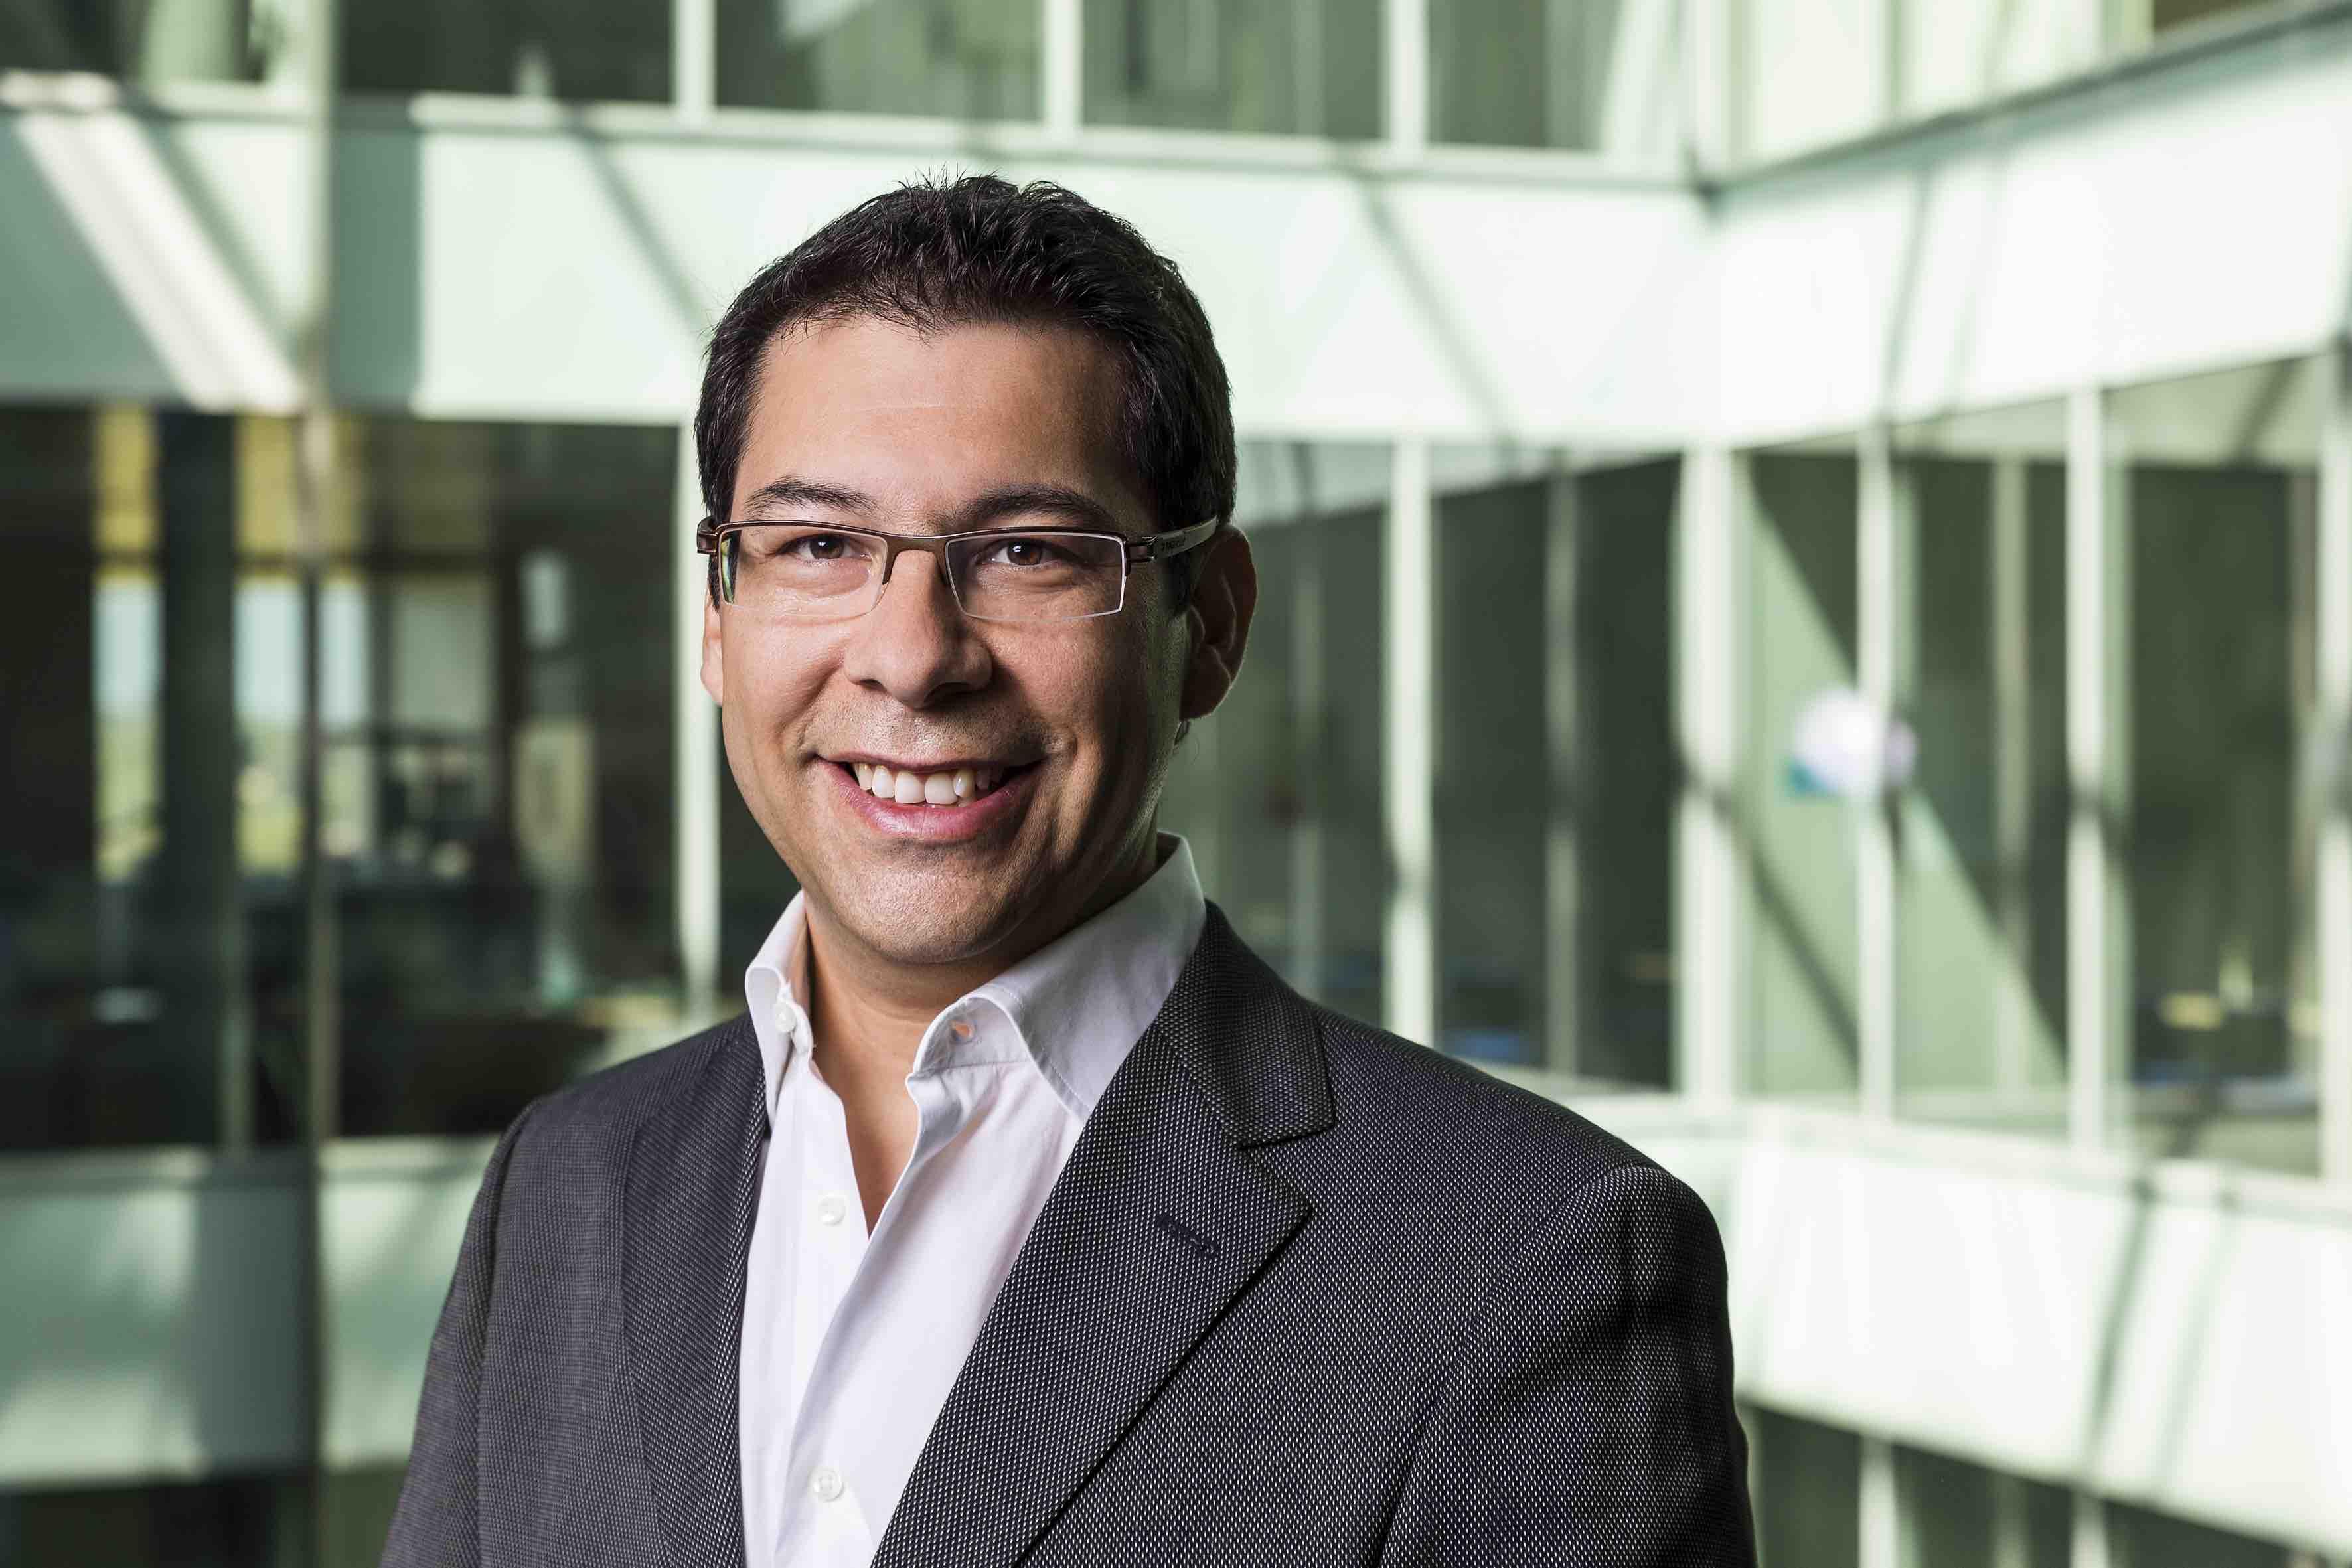 Dr. Juan Montoya-Burgos